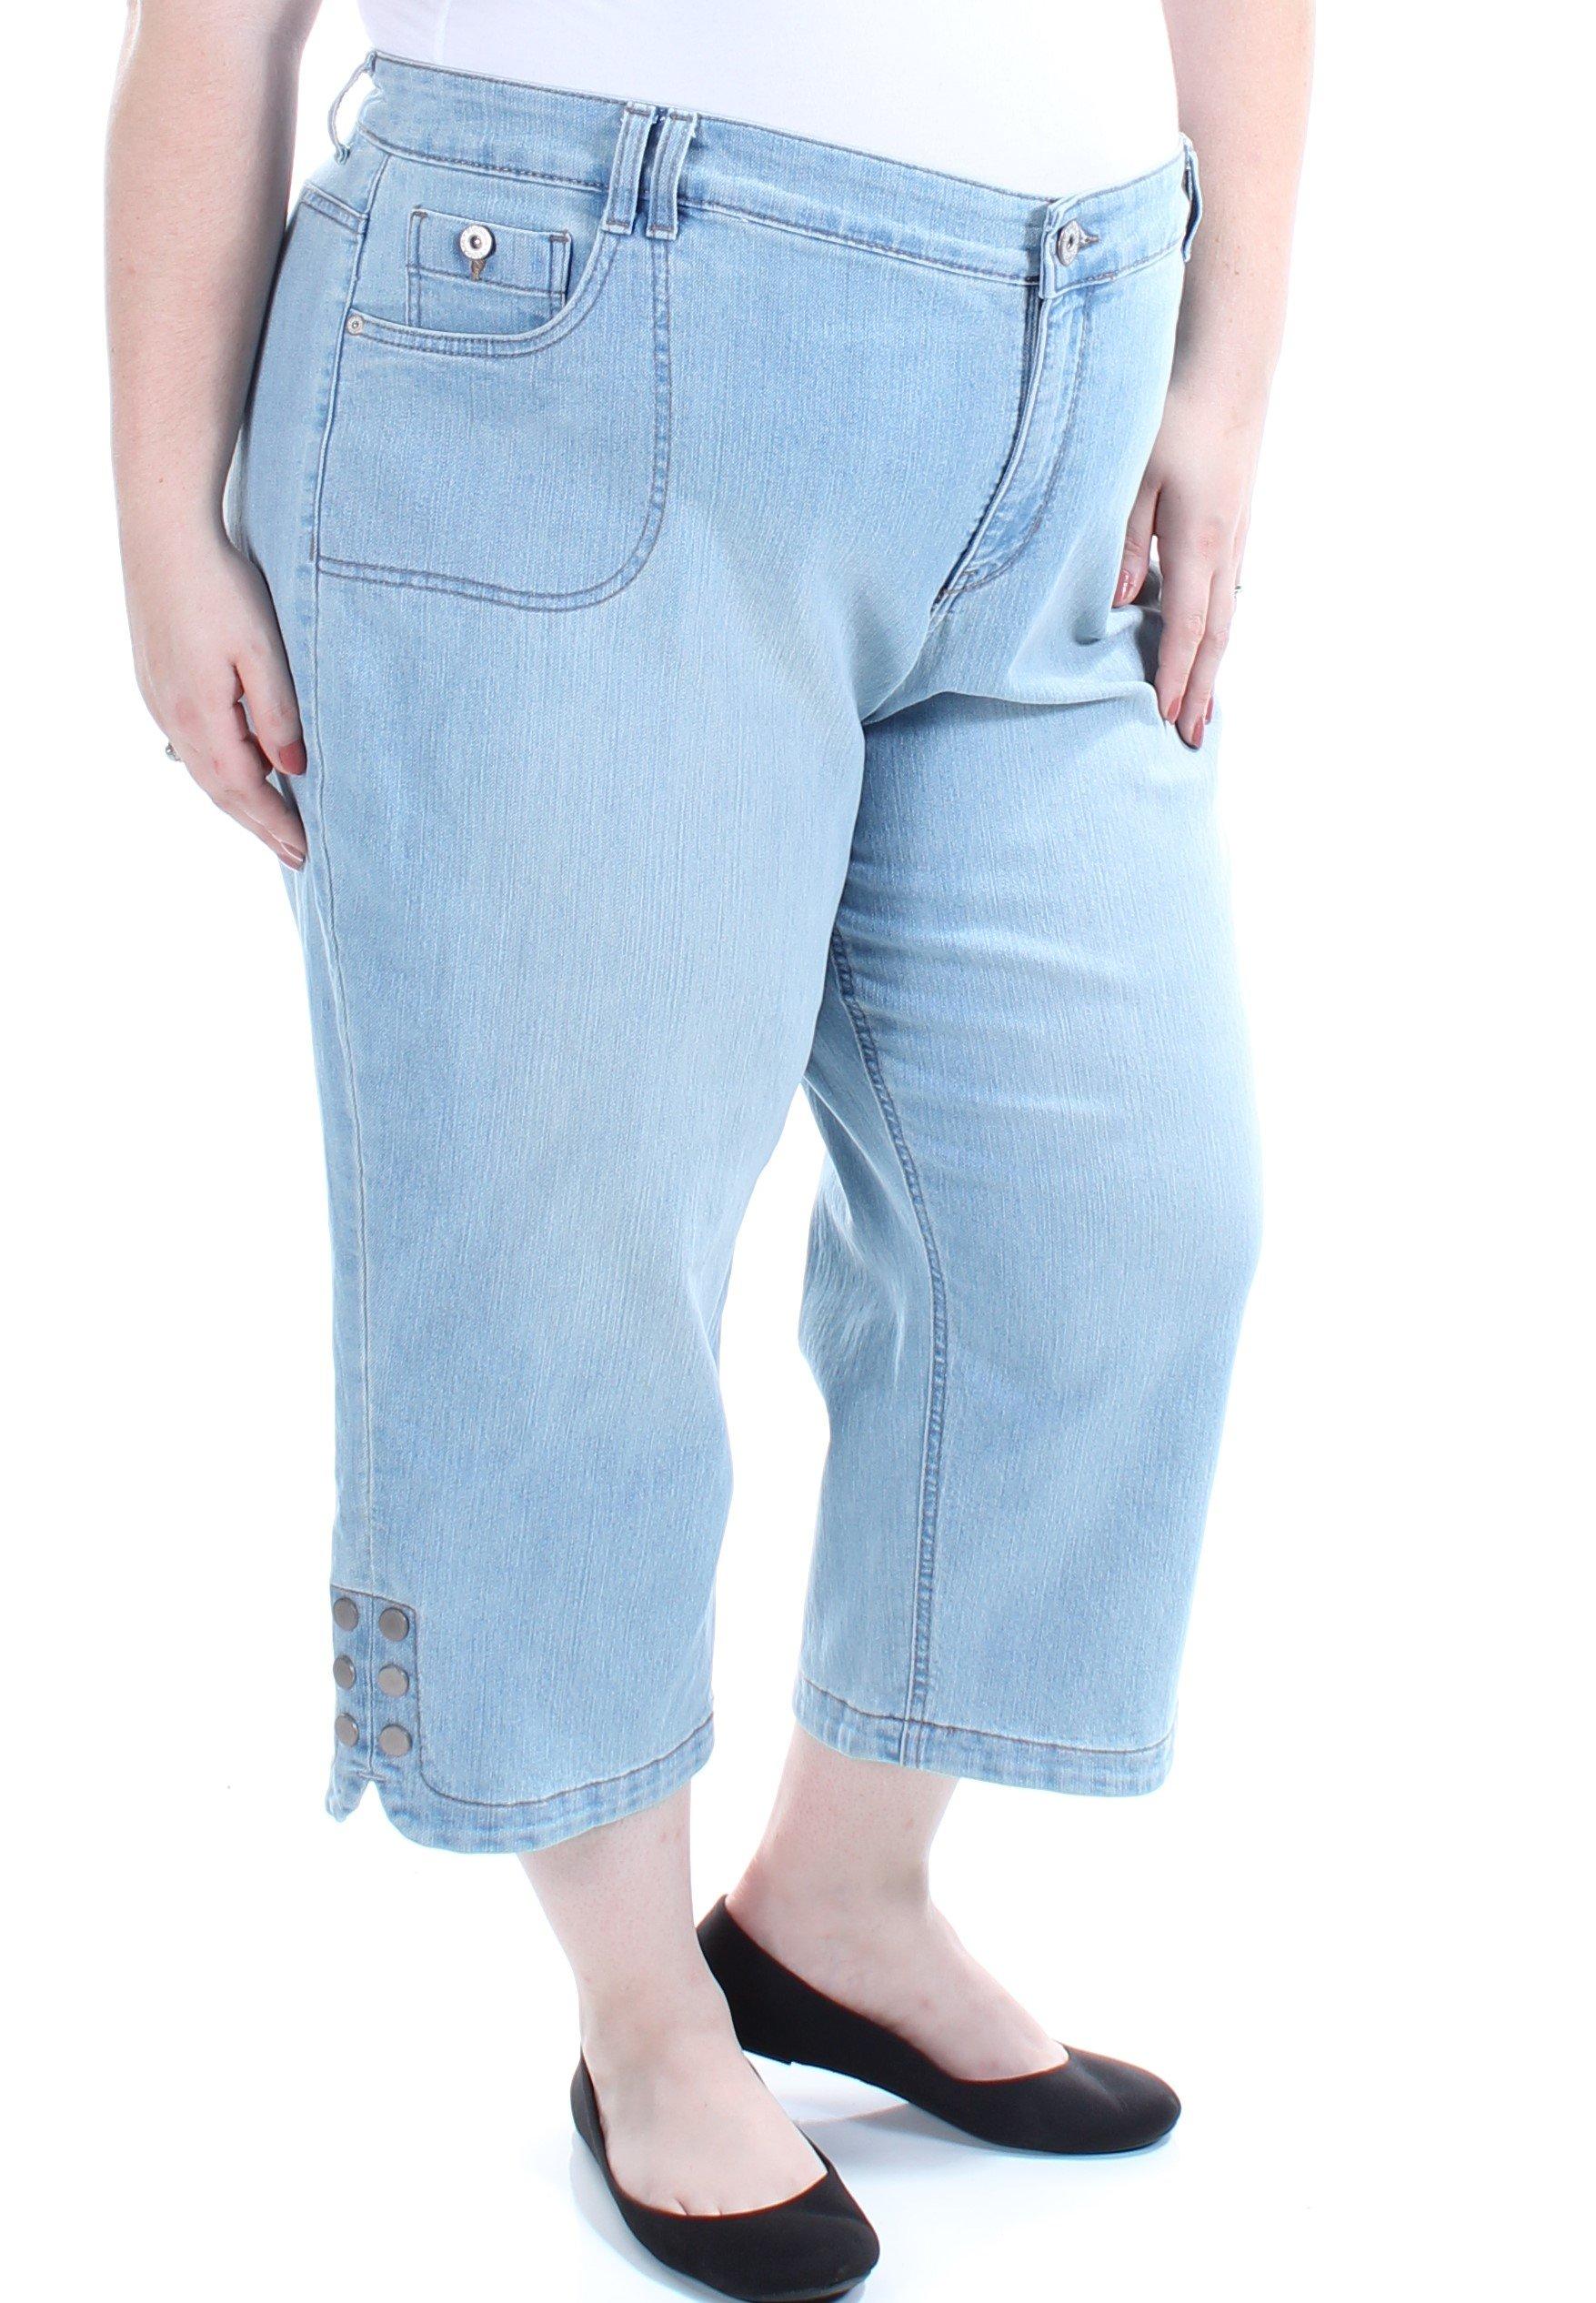 Style & Co. Womens Fashion Mid_Rise Button Leg Capri Jeans Blue 24W